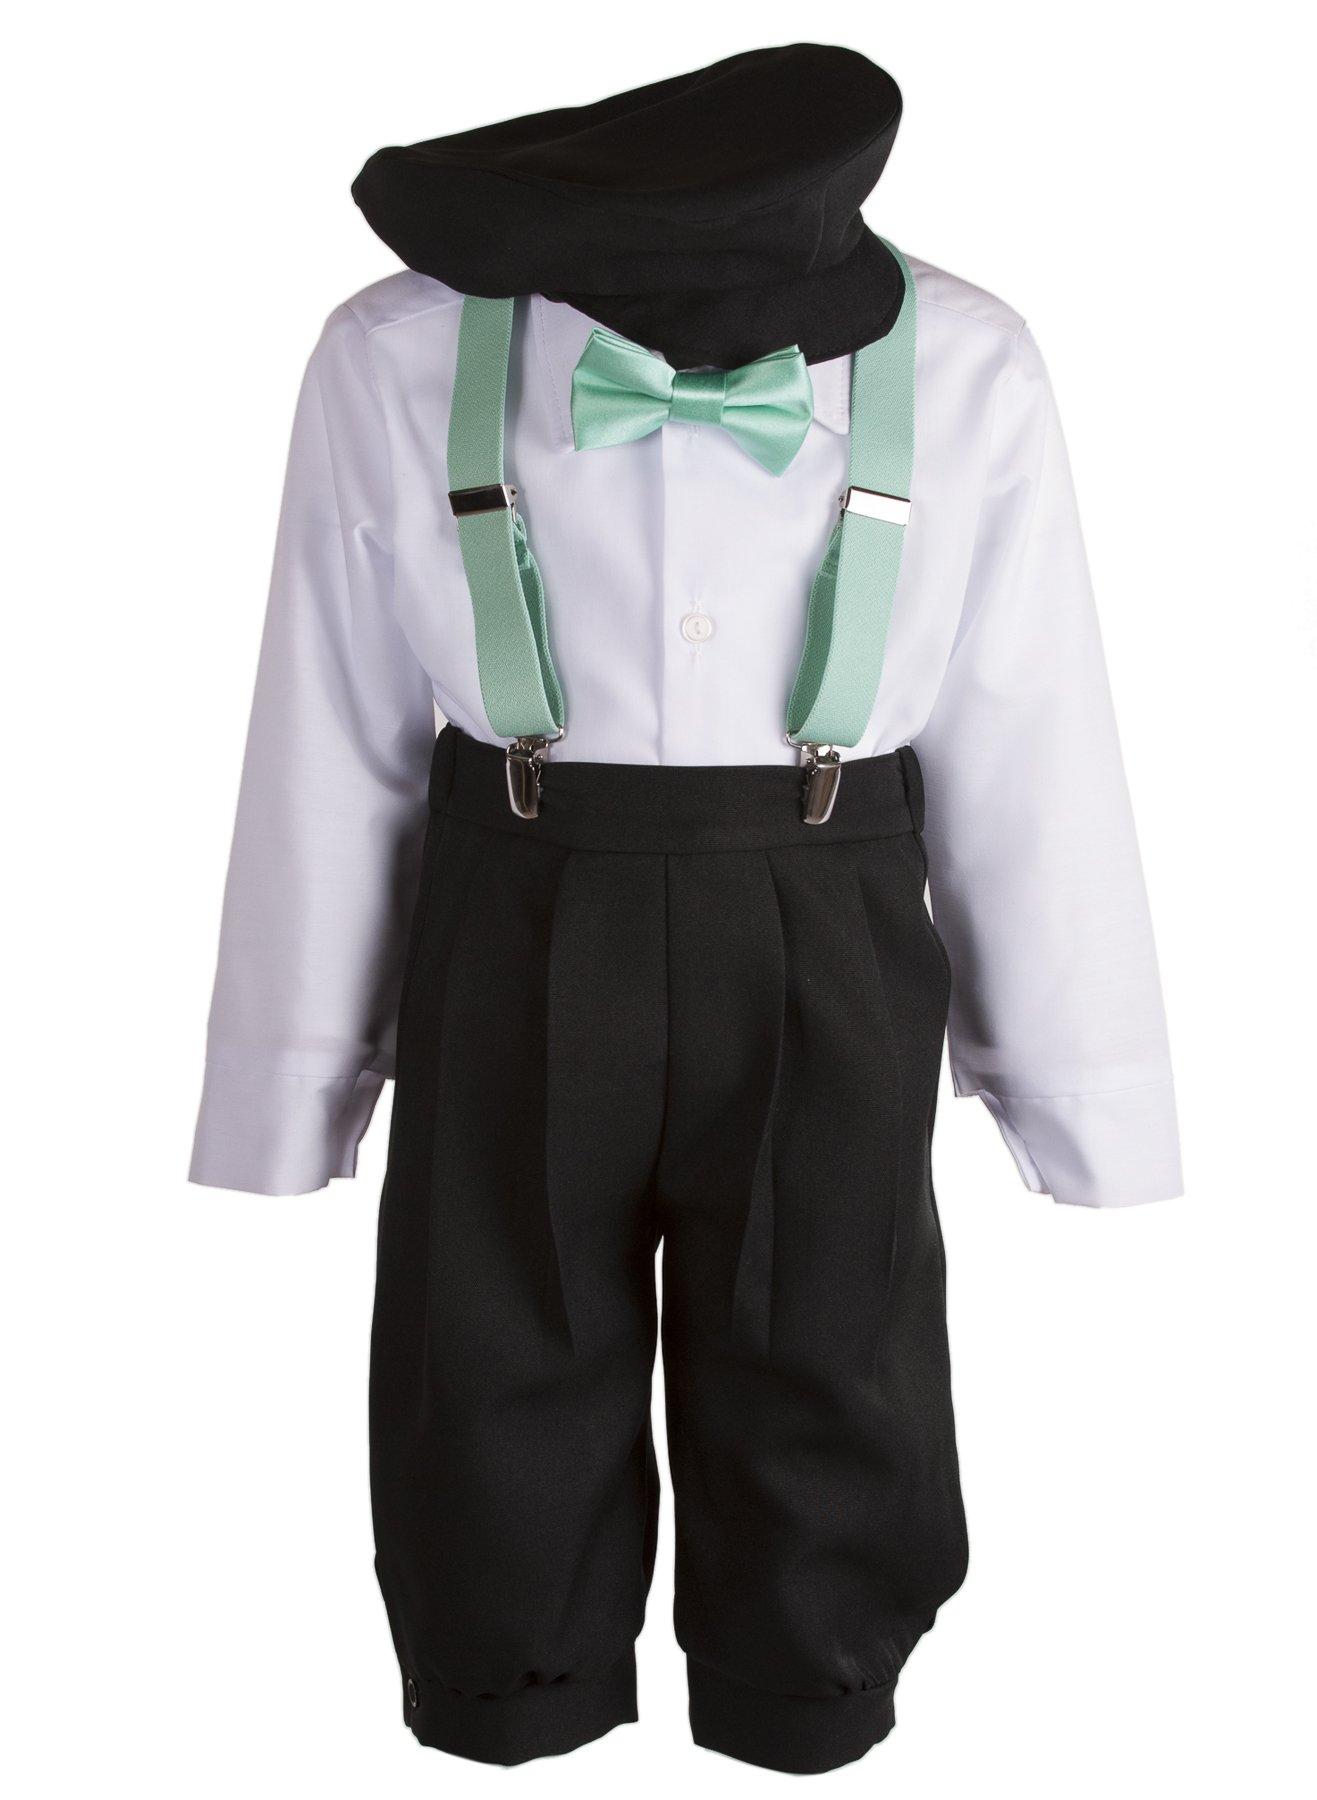 Boys Black Knickers Set Pageboy Cap Mint Suspenders & Bow Tie (4 Boys)